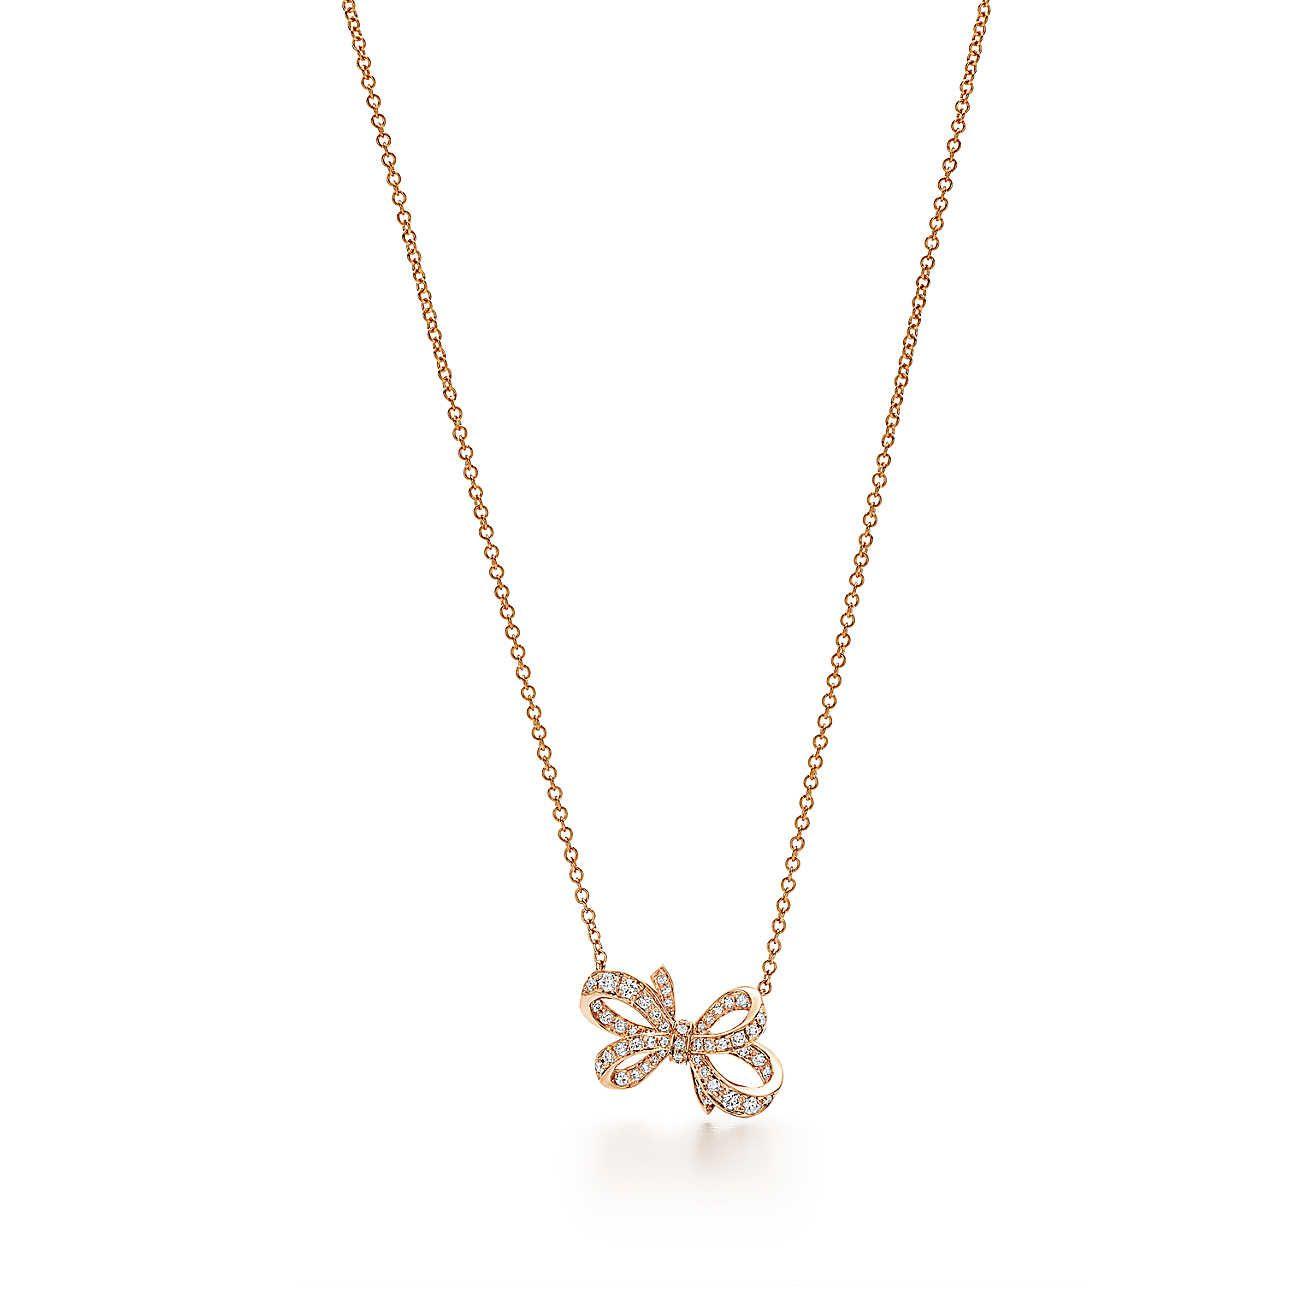 72dbfd90a 2019的Tiffany Bow Ribbon Pendant   Necklaces   Tiffany、Jewelry 和 ...